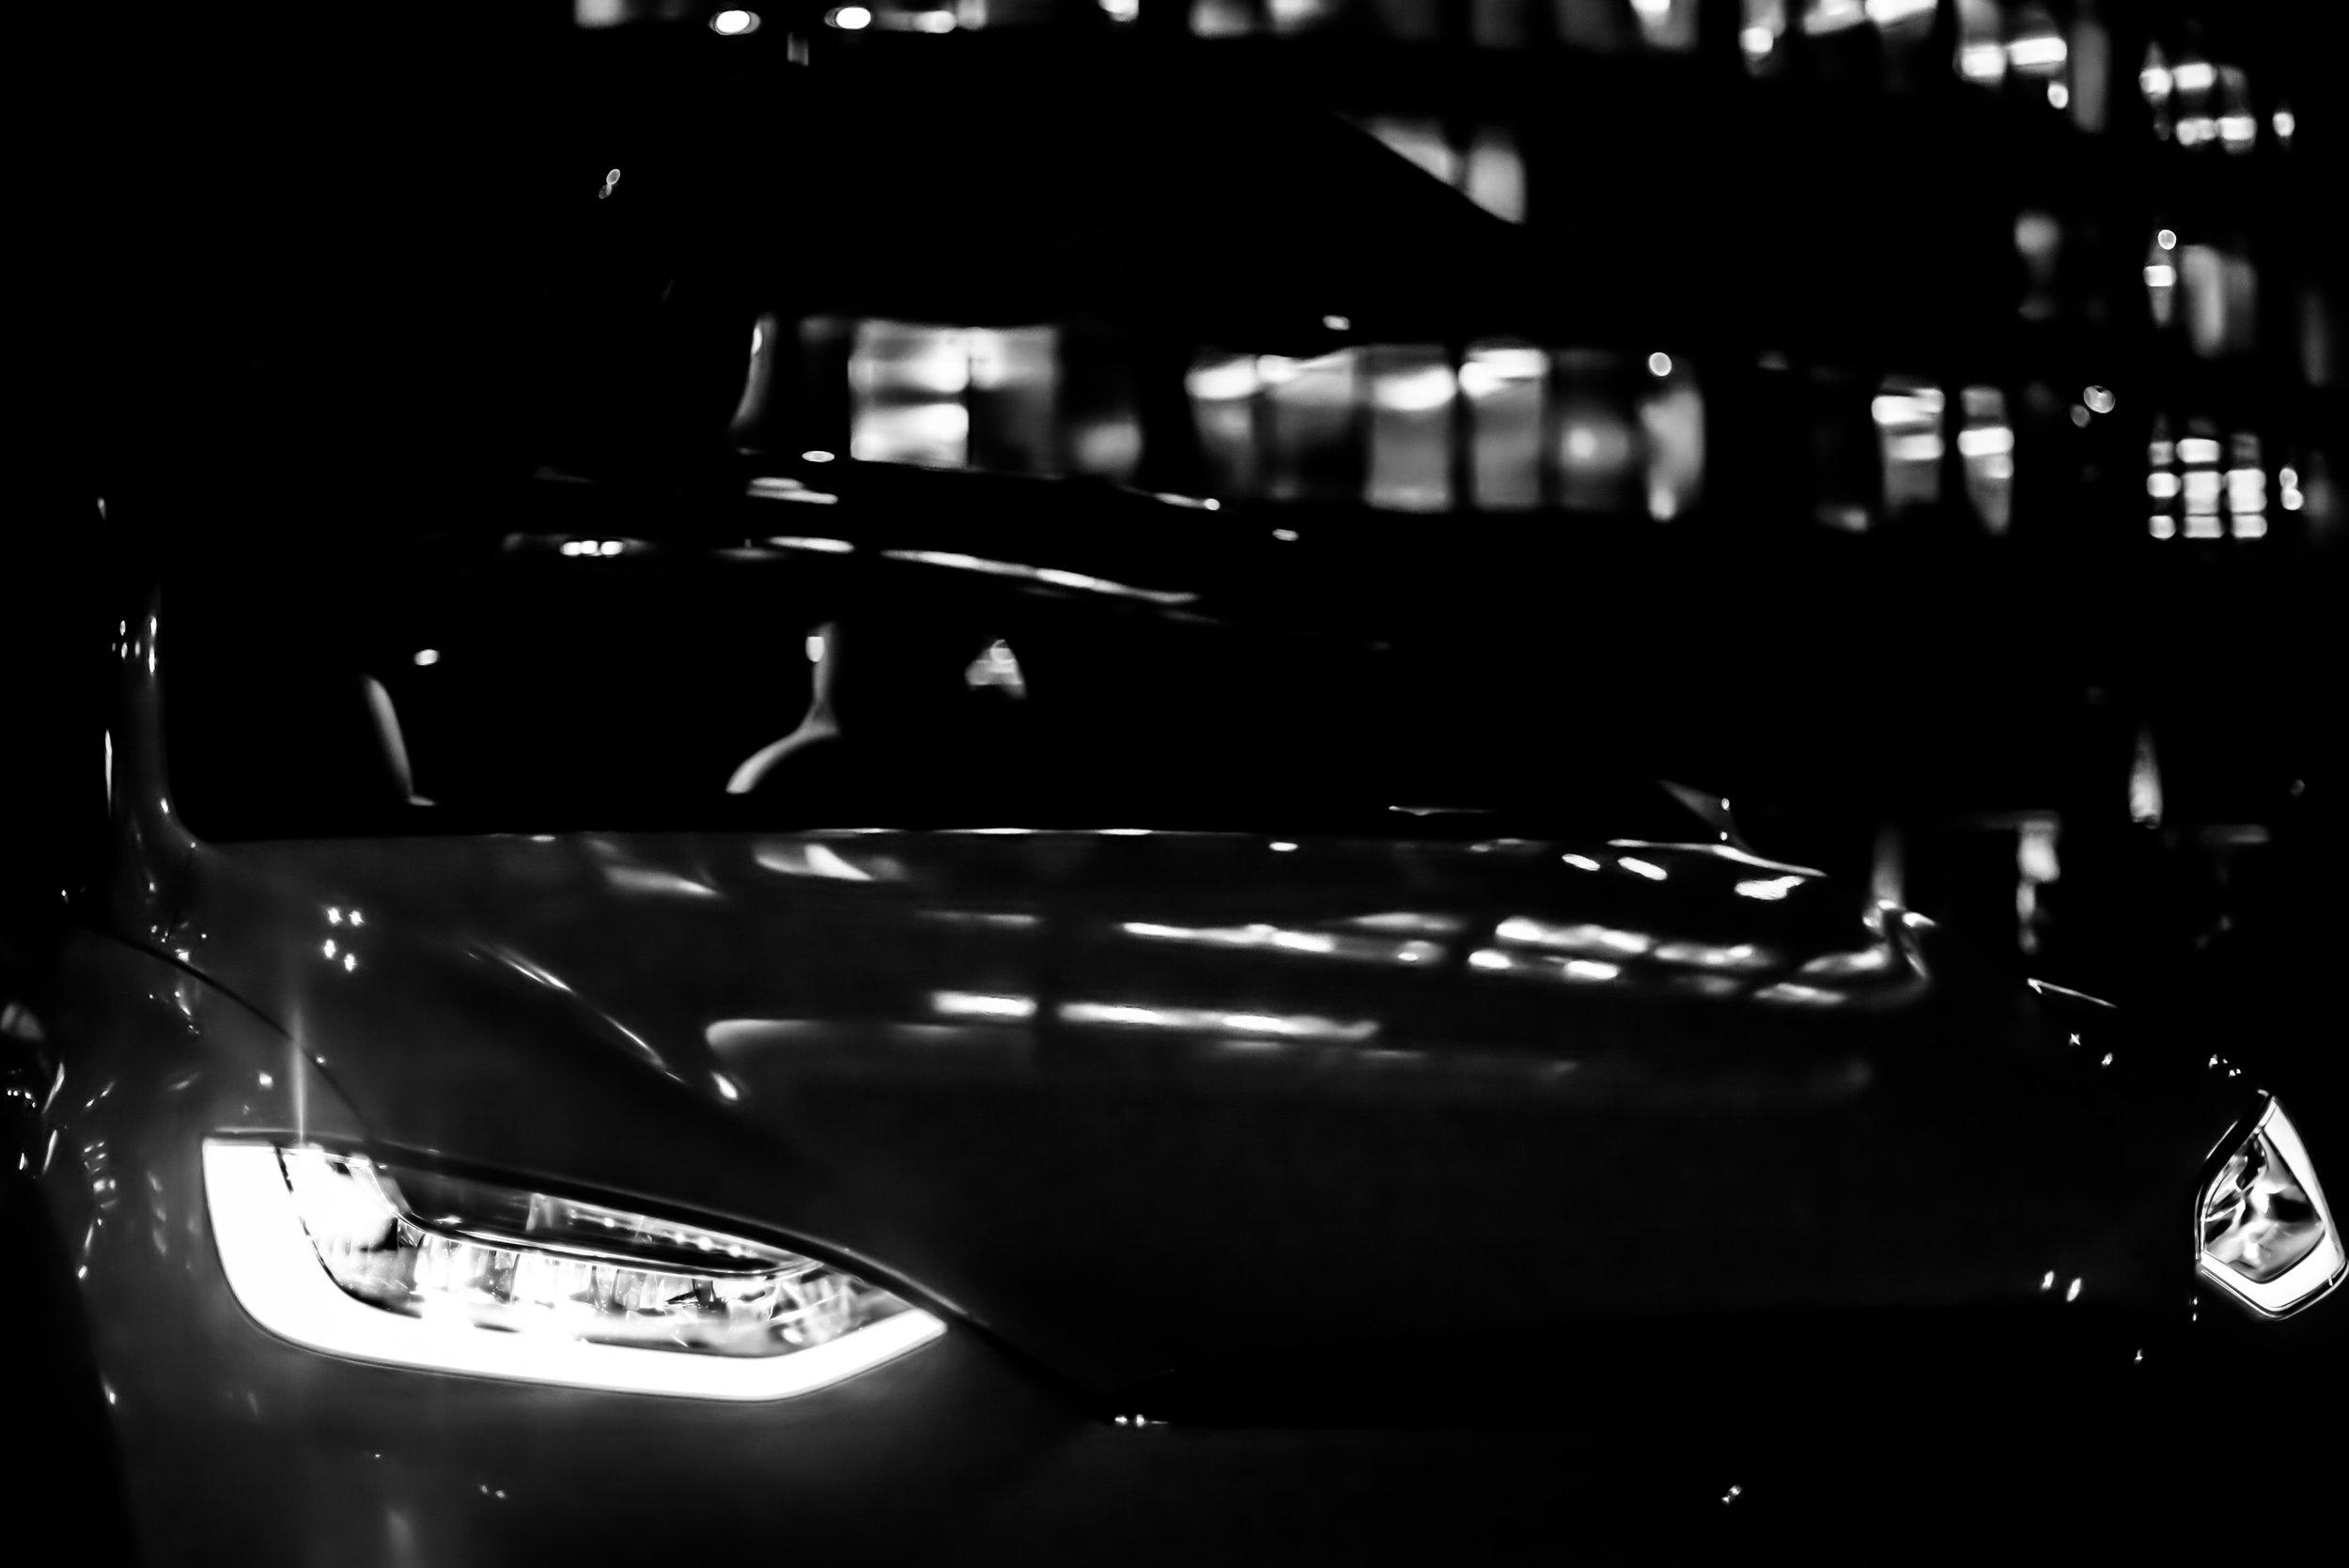 fleet+vehicle+sexy+car+photo+video+speed+tesla+p100d+vadym+guliuk+photography-12.jpg